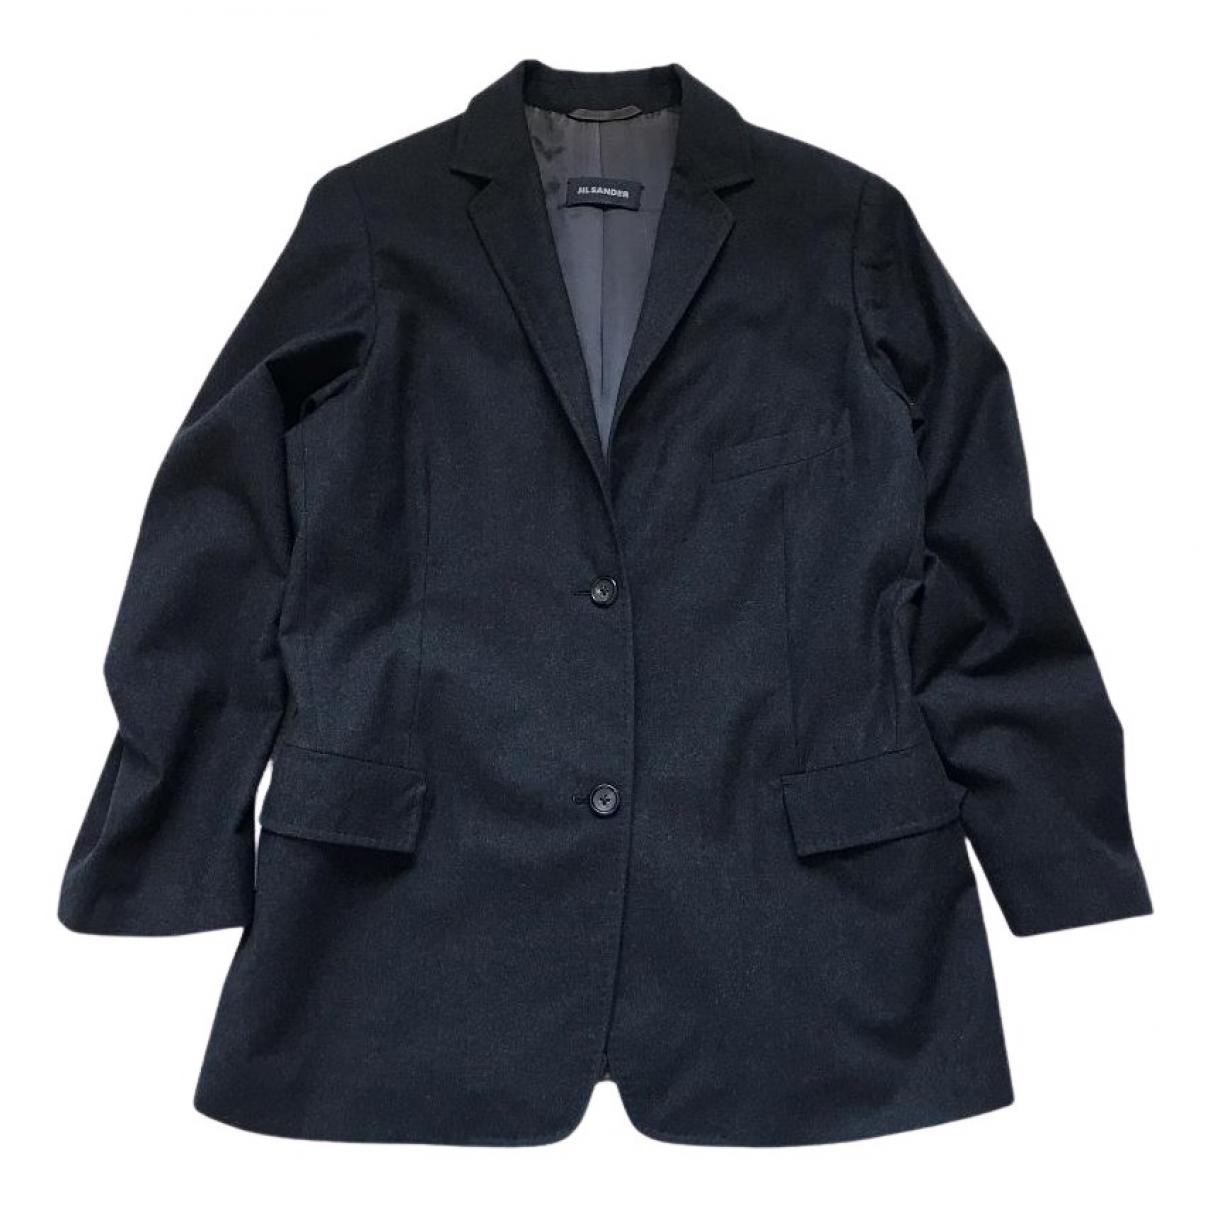 Jil Sander \N Anthracite Wool jacket for Women M International